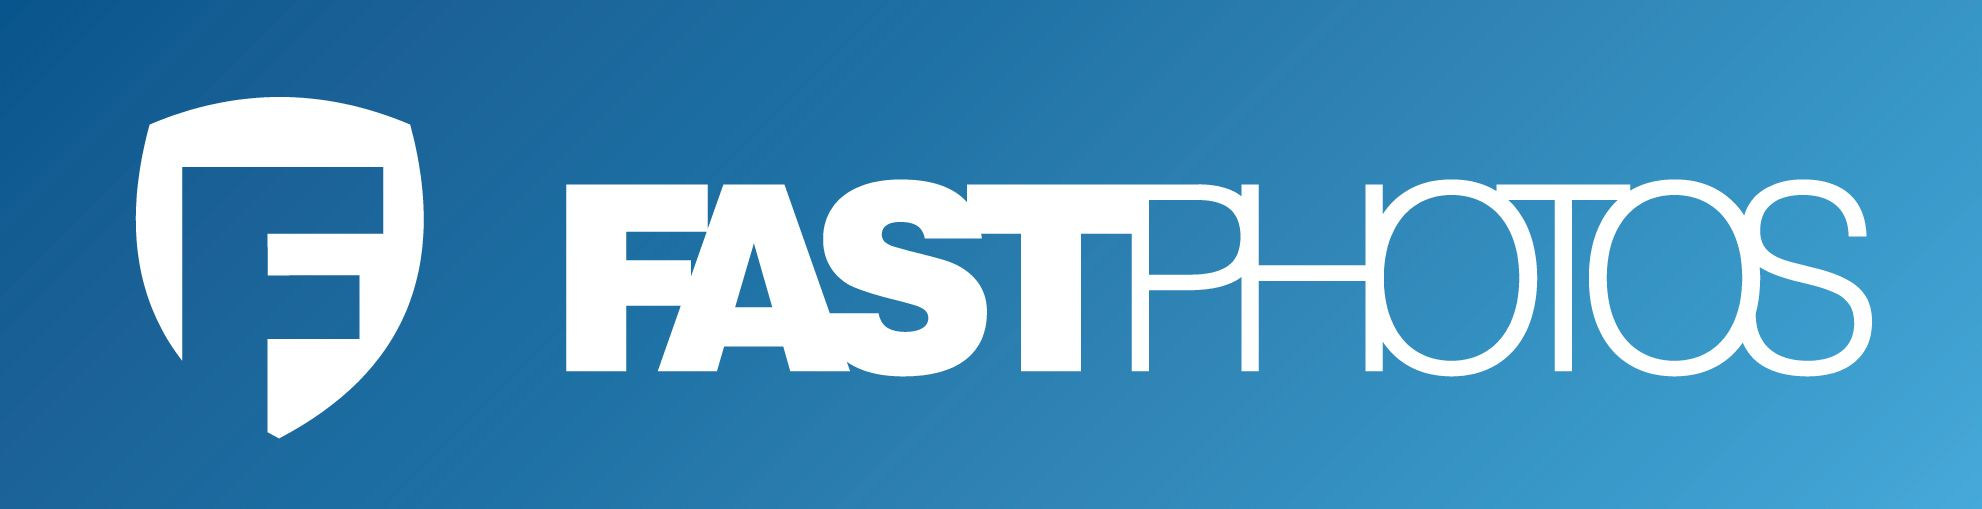 fastphotos